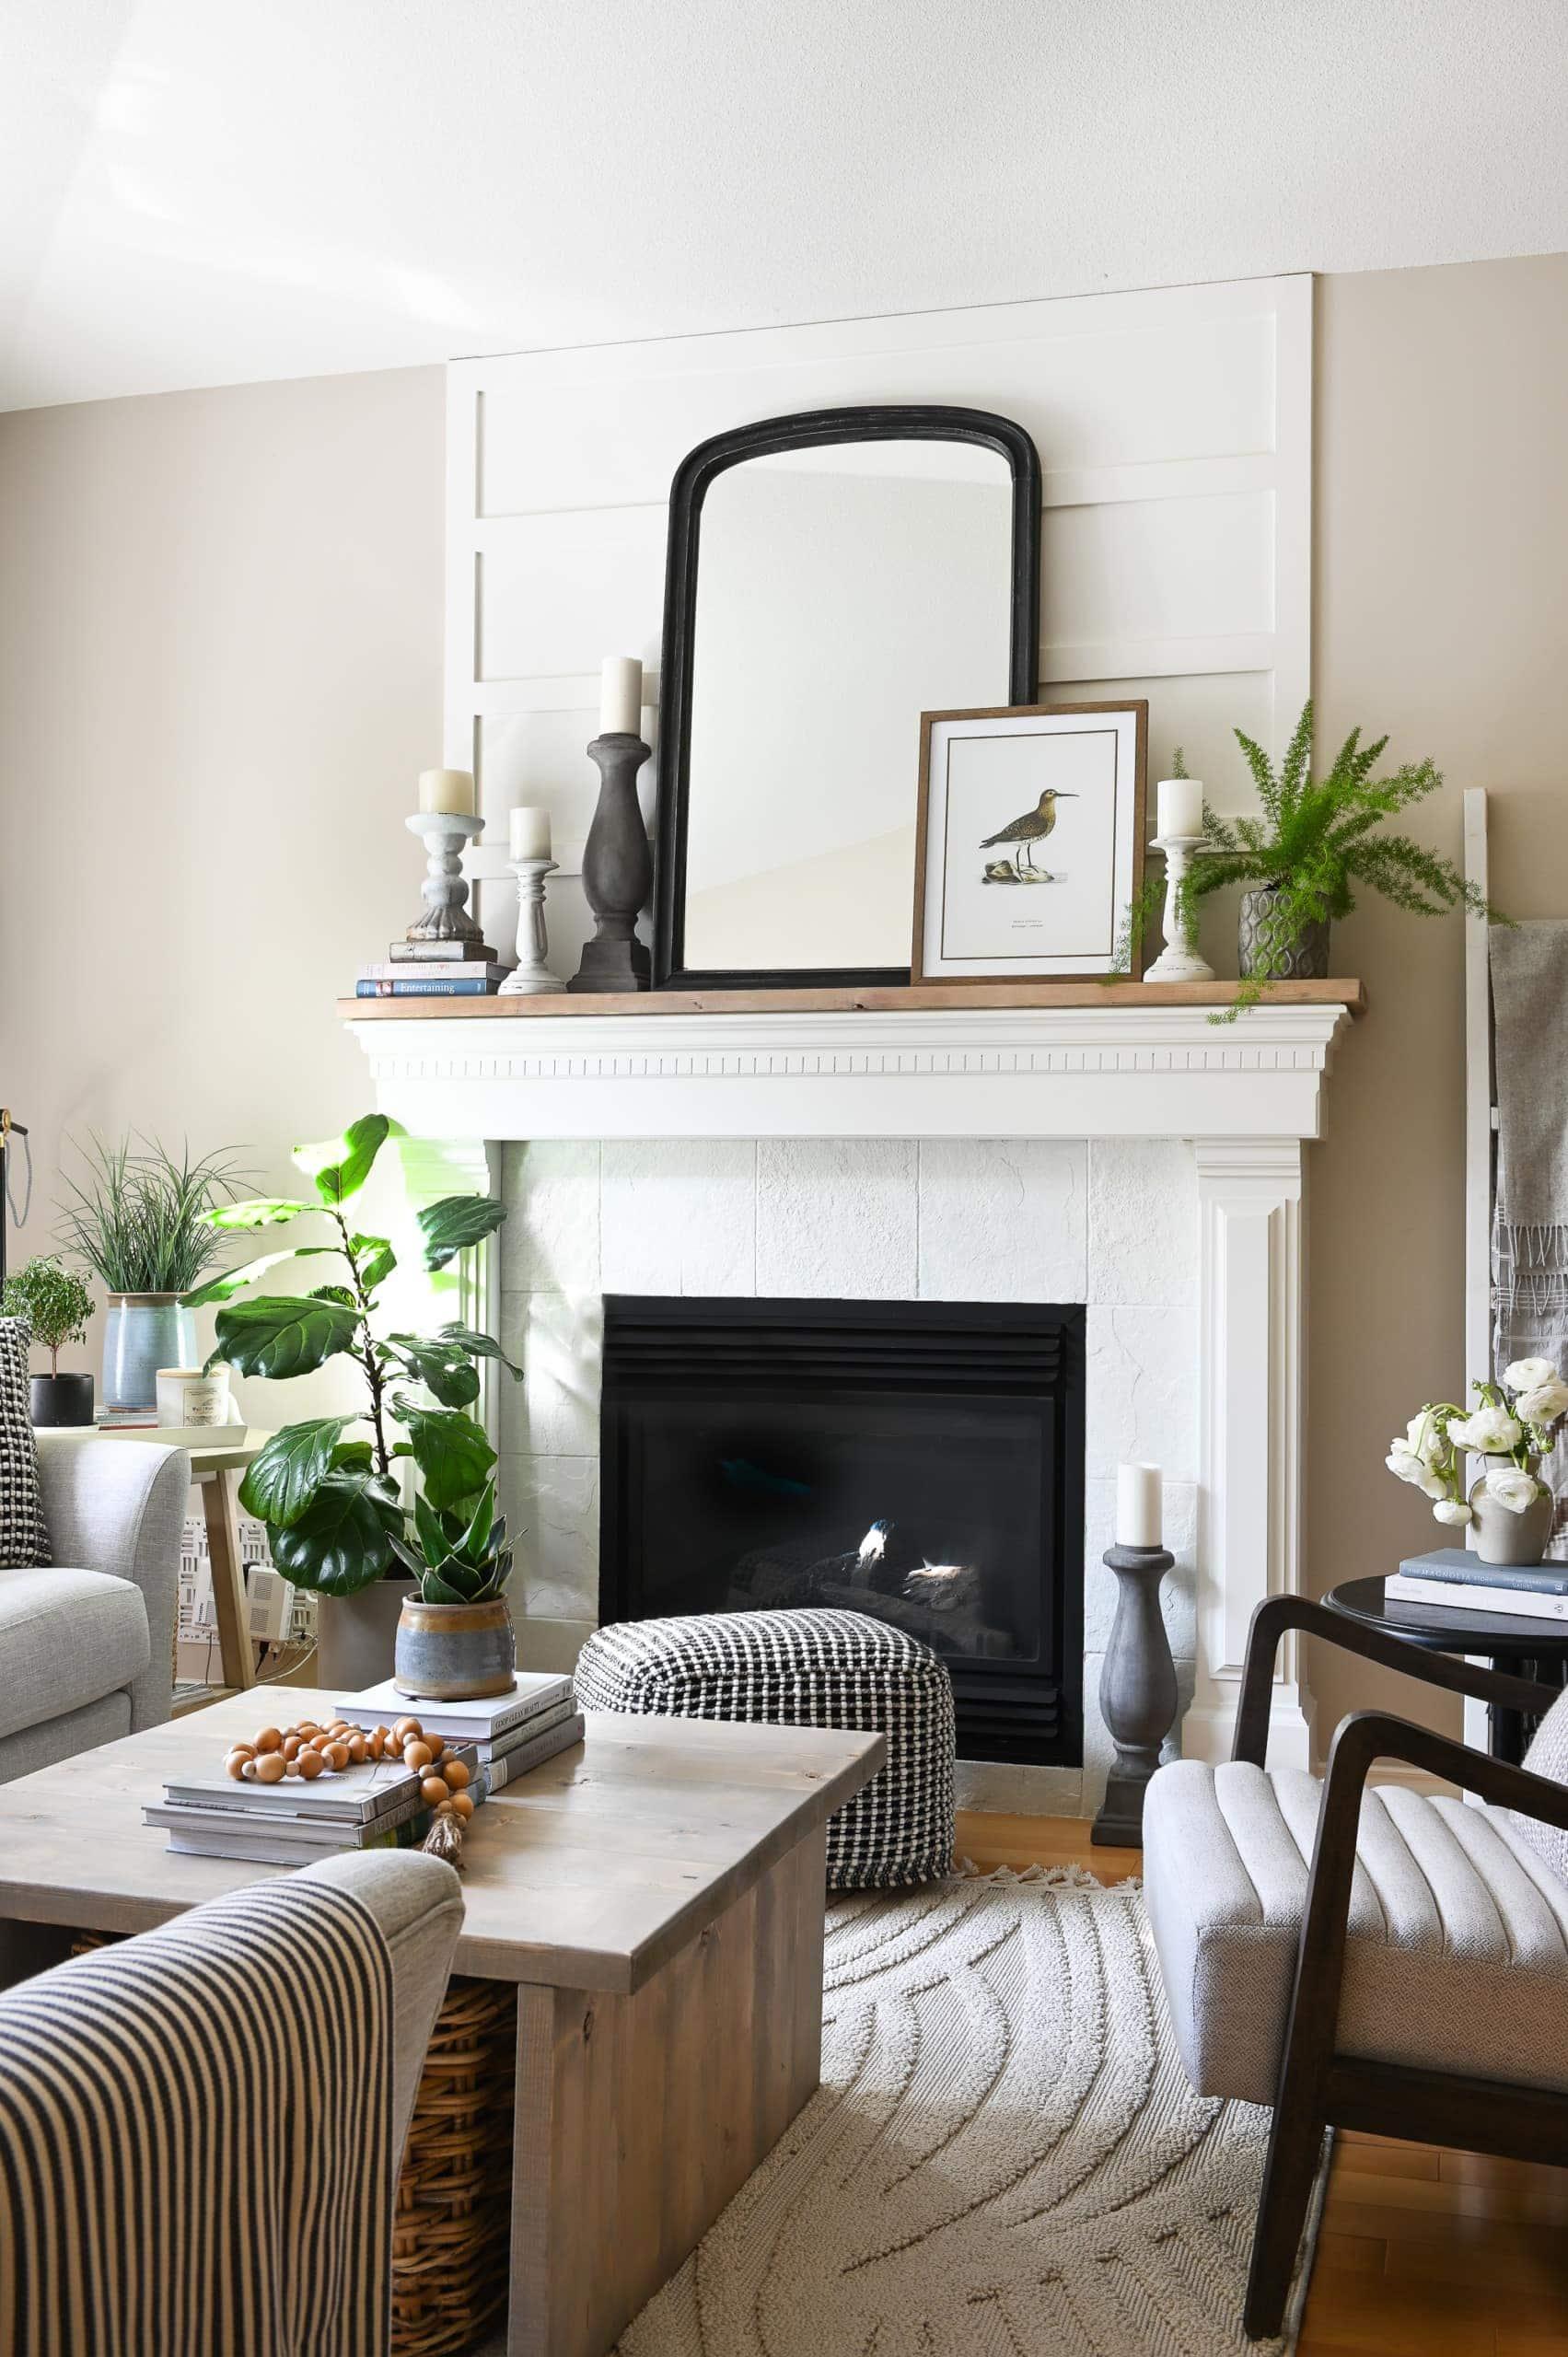 DIY farmhouse style fireplace